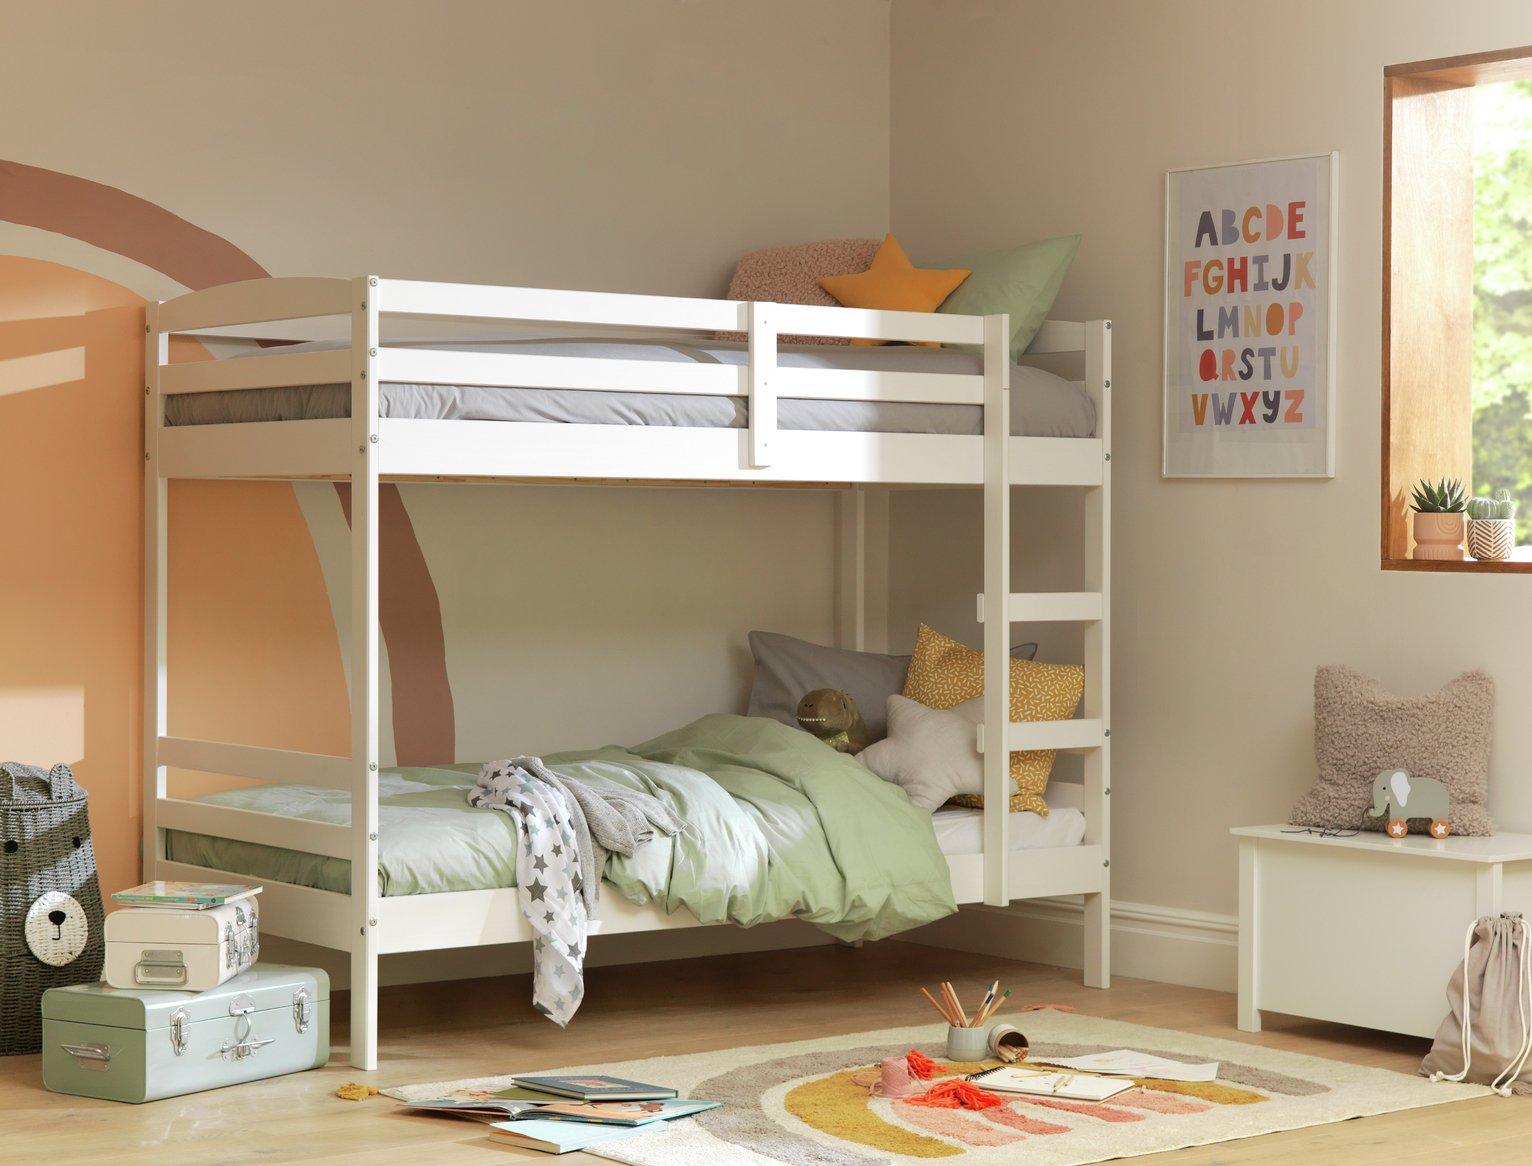 Argos Home Josie Shorty Bunk Bed Frame - Grey